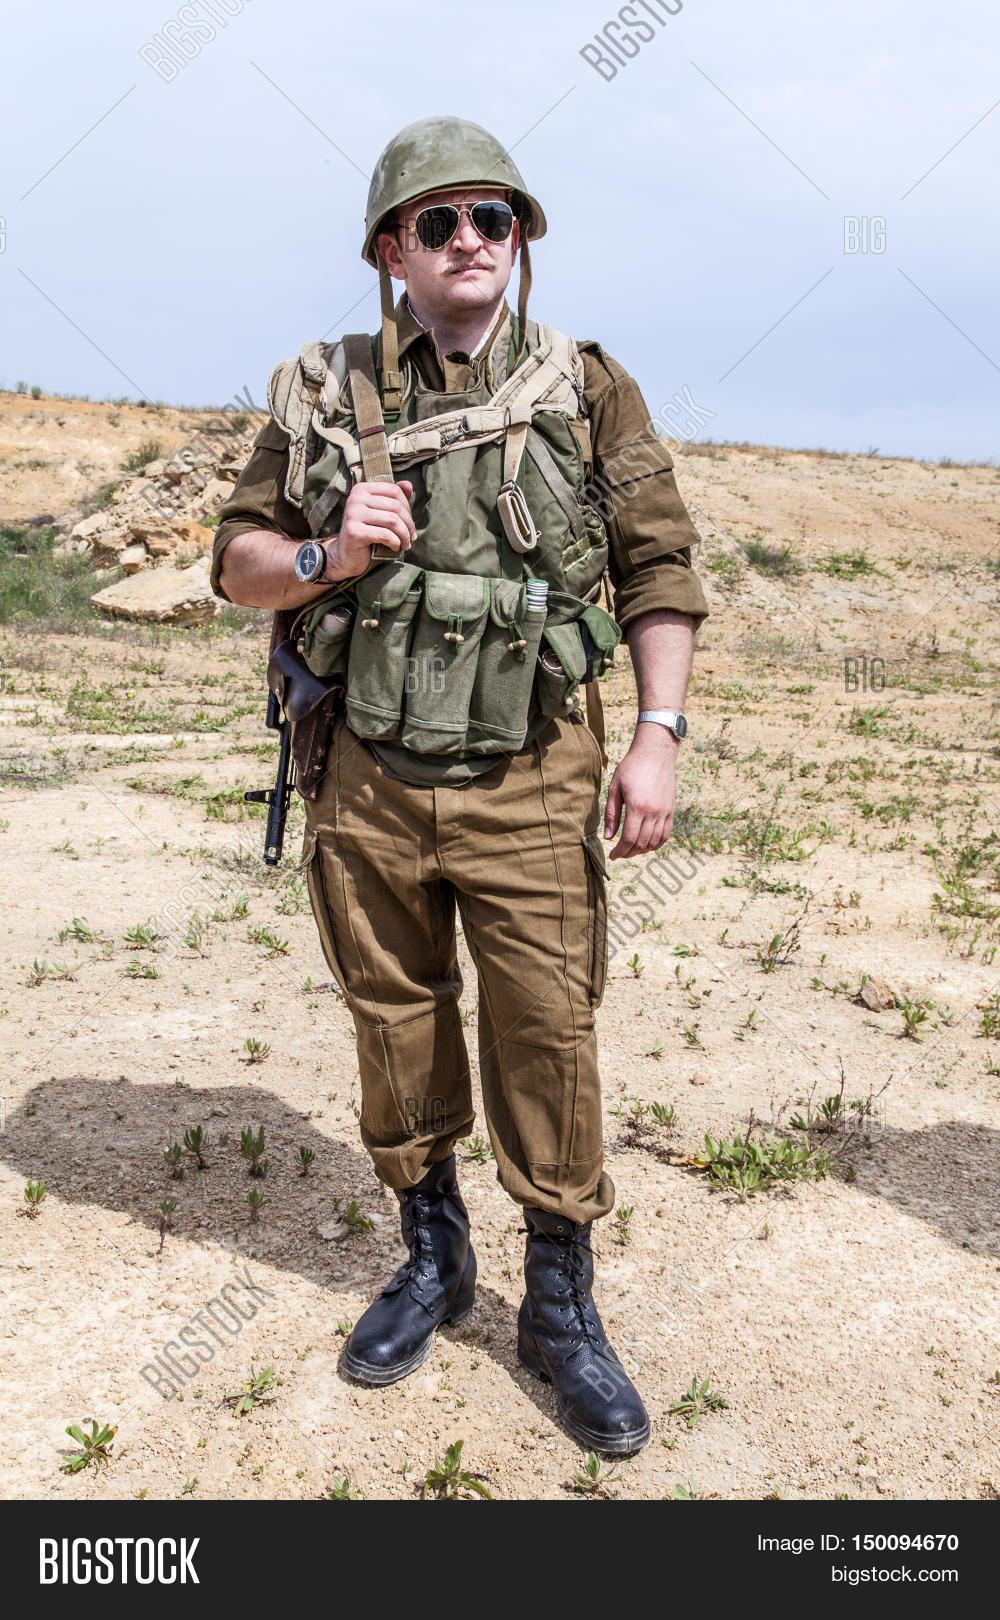 Soviet Paratrooper Image & Photo (Free Trial) | Bigstock